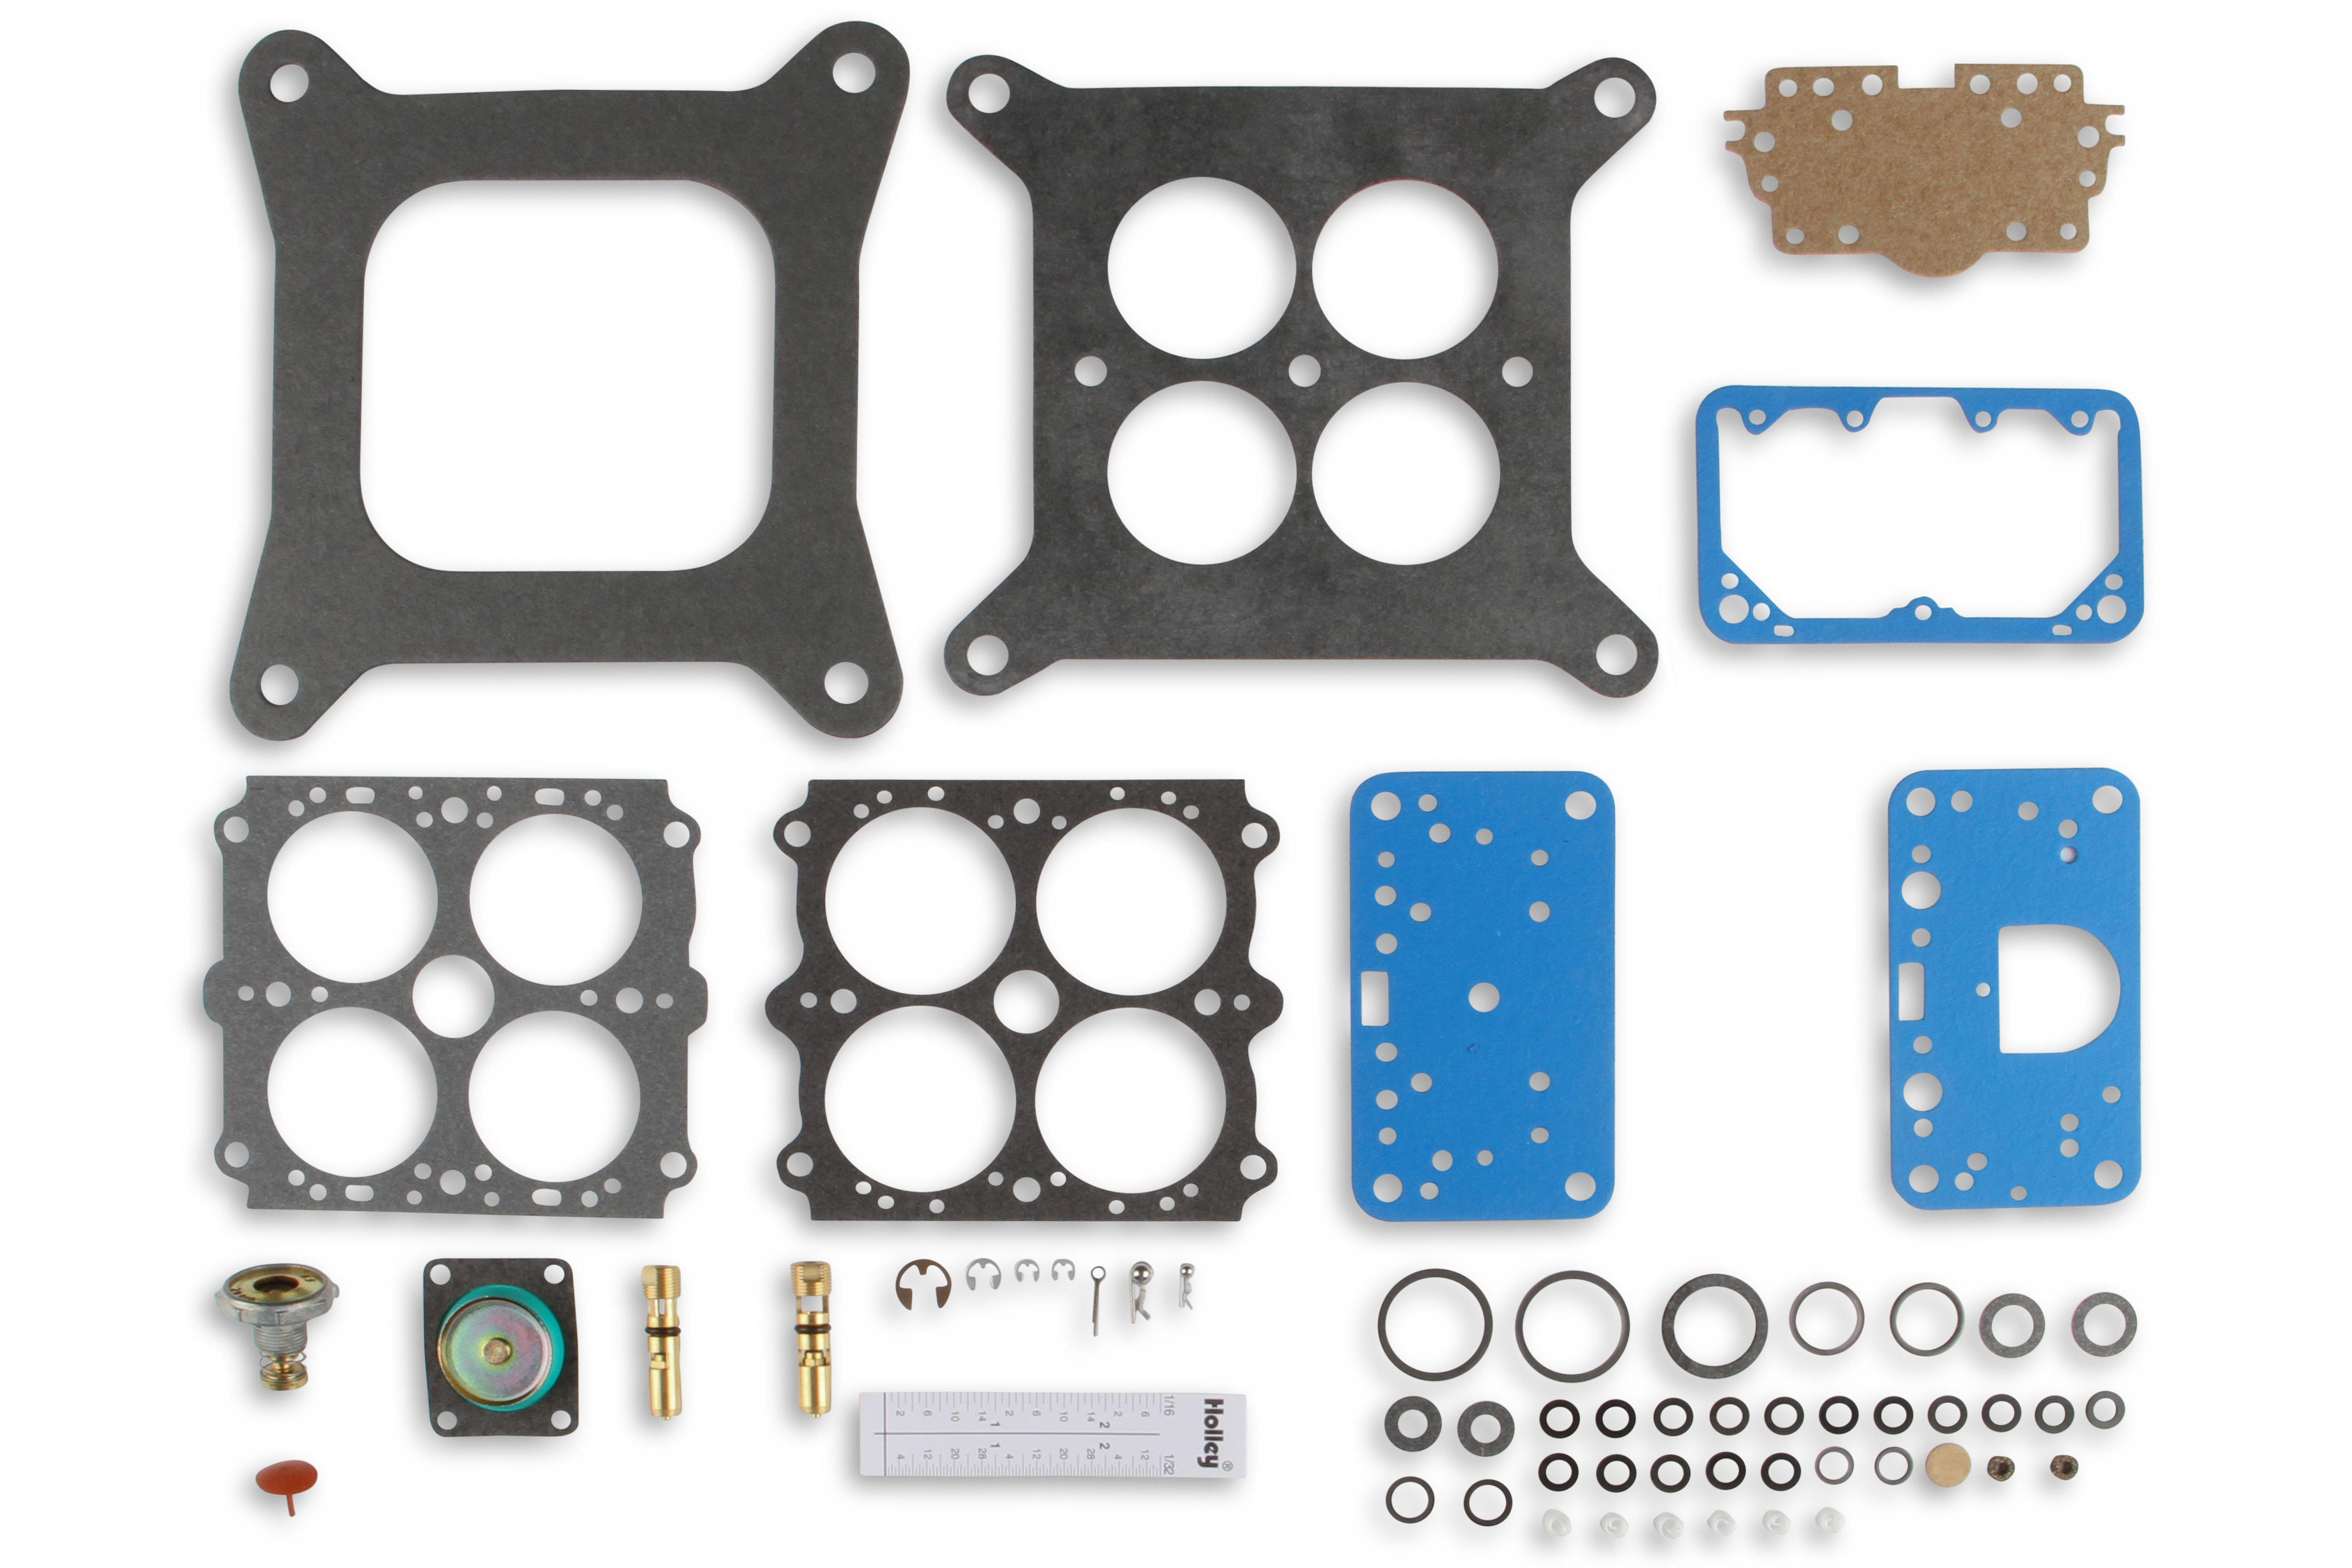 Holley 37-754 Carb Rebuild Kit for 4160 Series 750 CFM